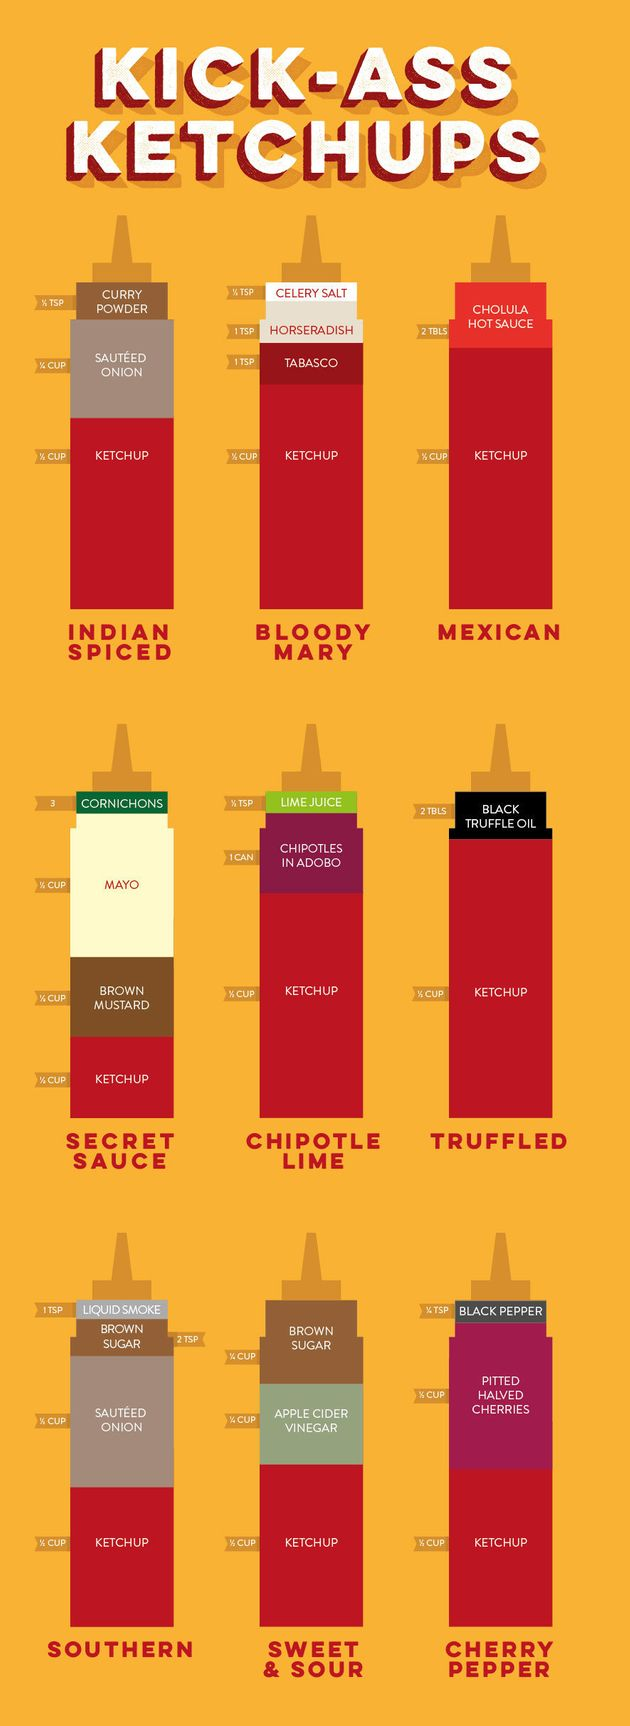 Kick-Ass Ketchup Recipes You Can Make Yourself